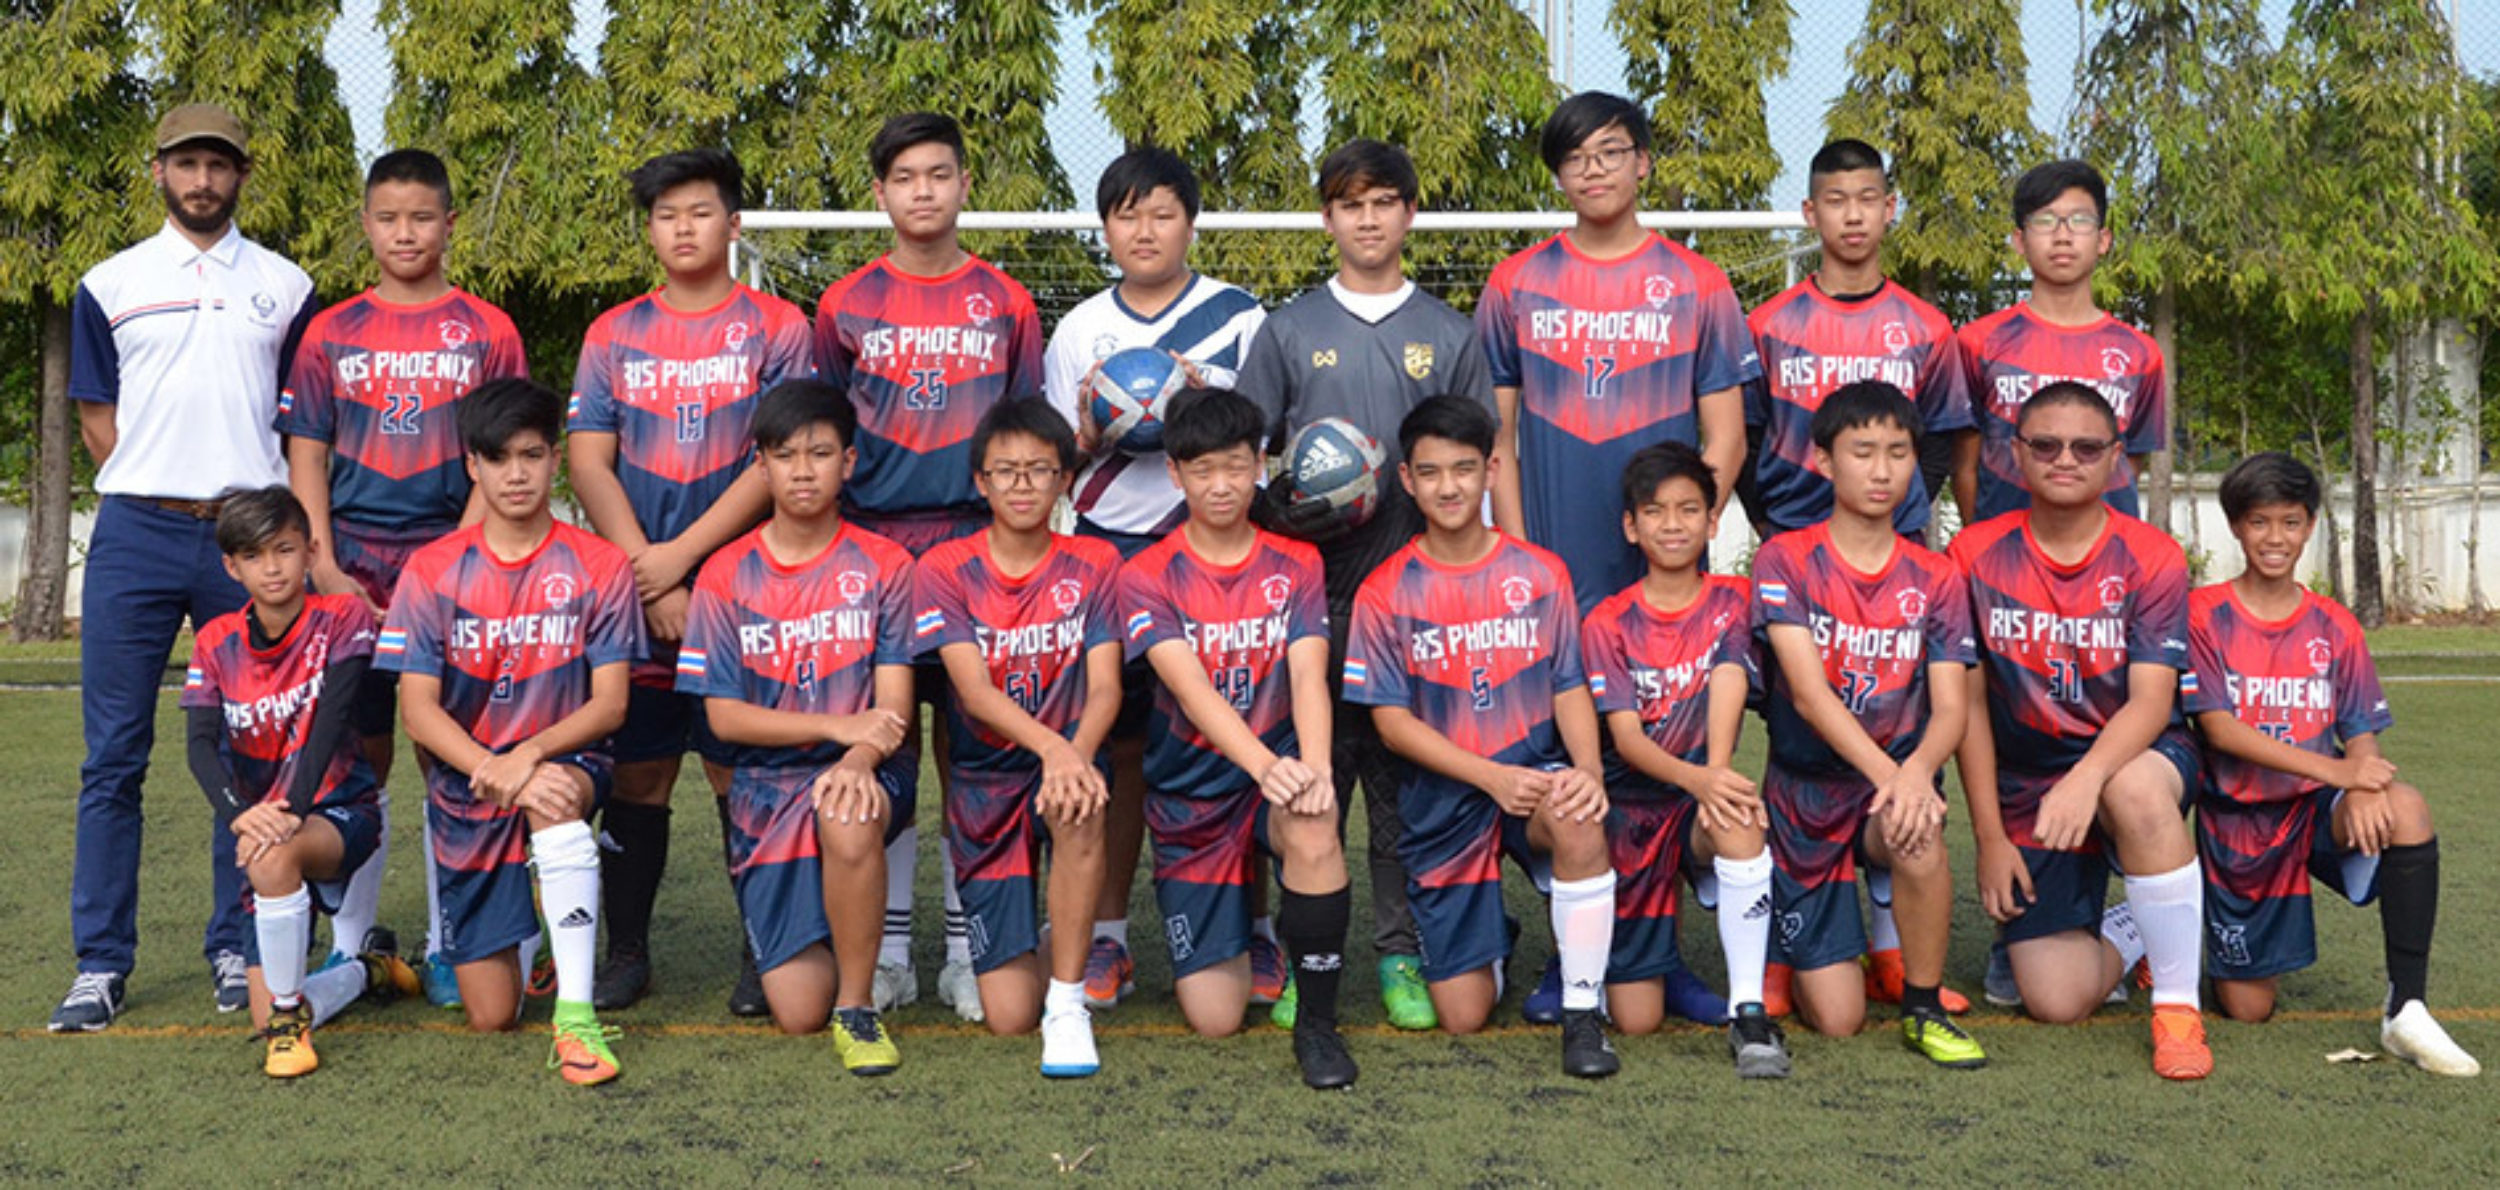 U15 Boys Soccer